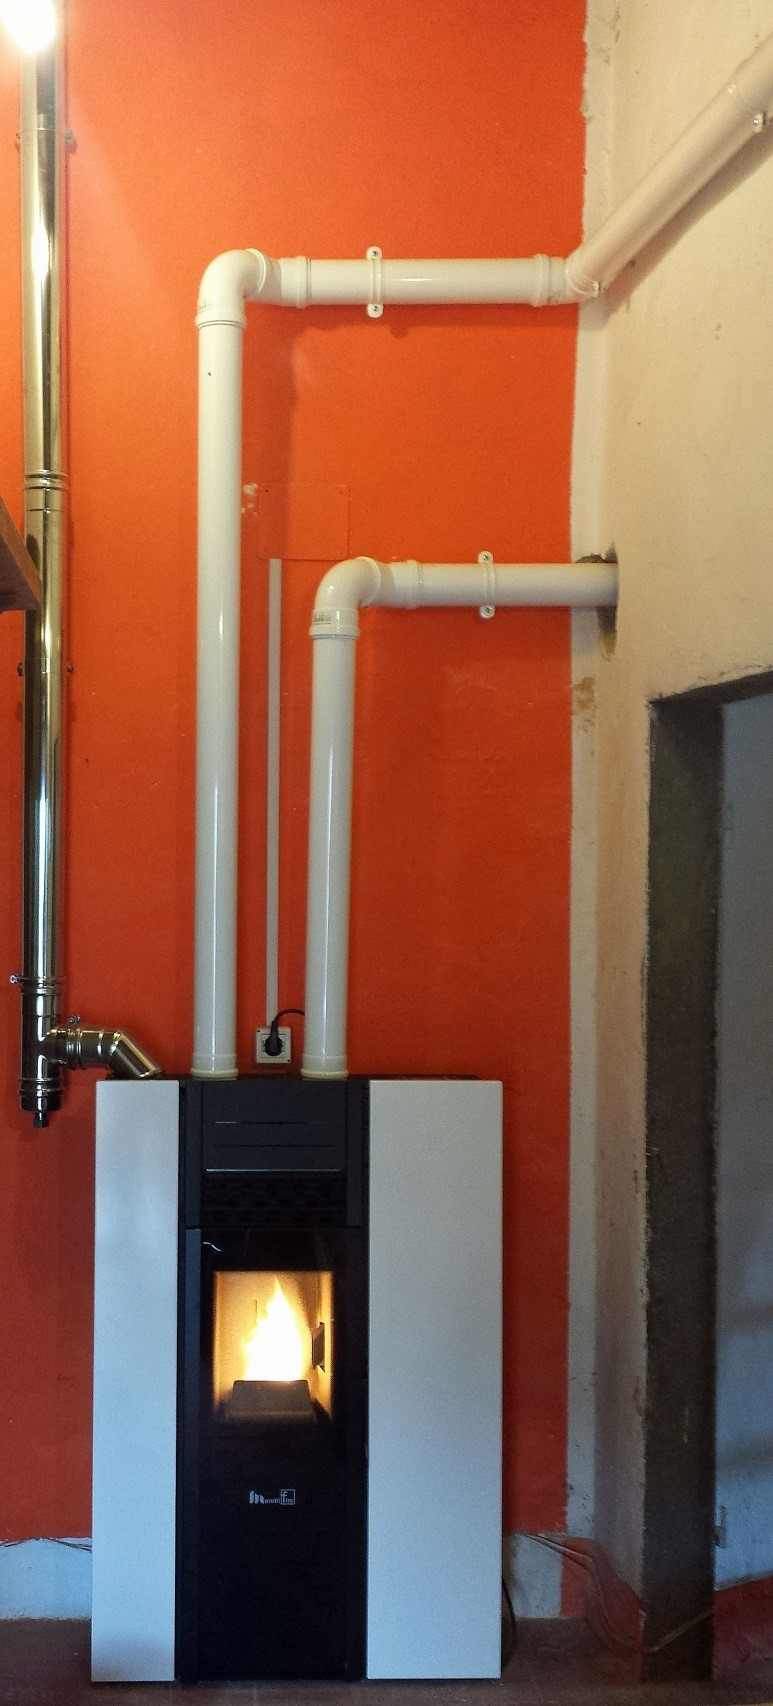 Stufa a pellet slim canalizzata ecohabitat impianti - Stufa a pellet aria canalizzata ...